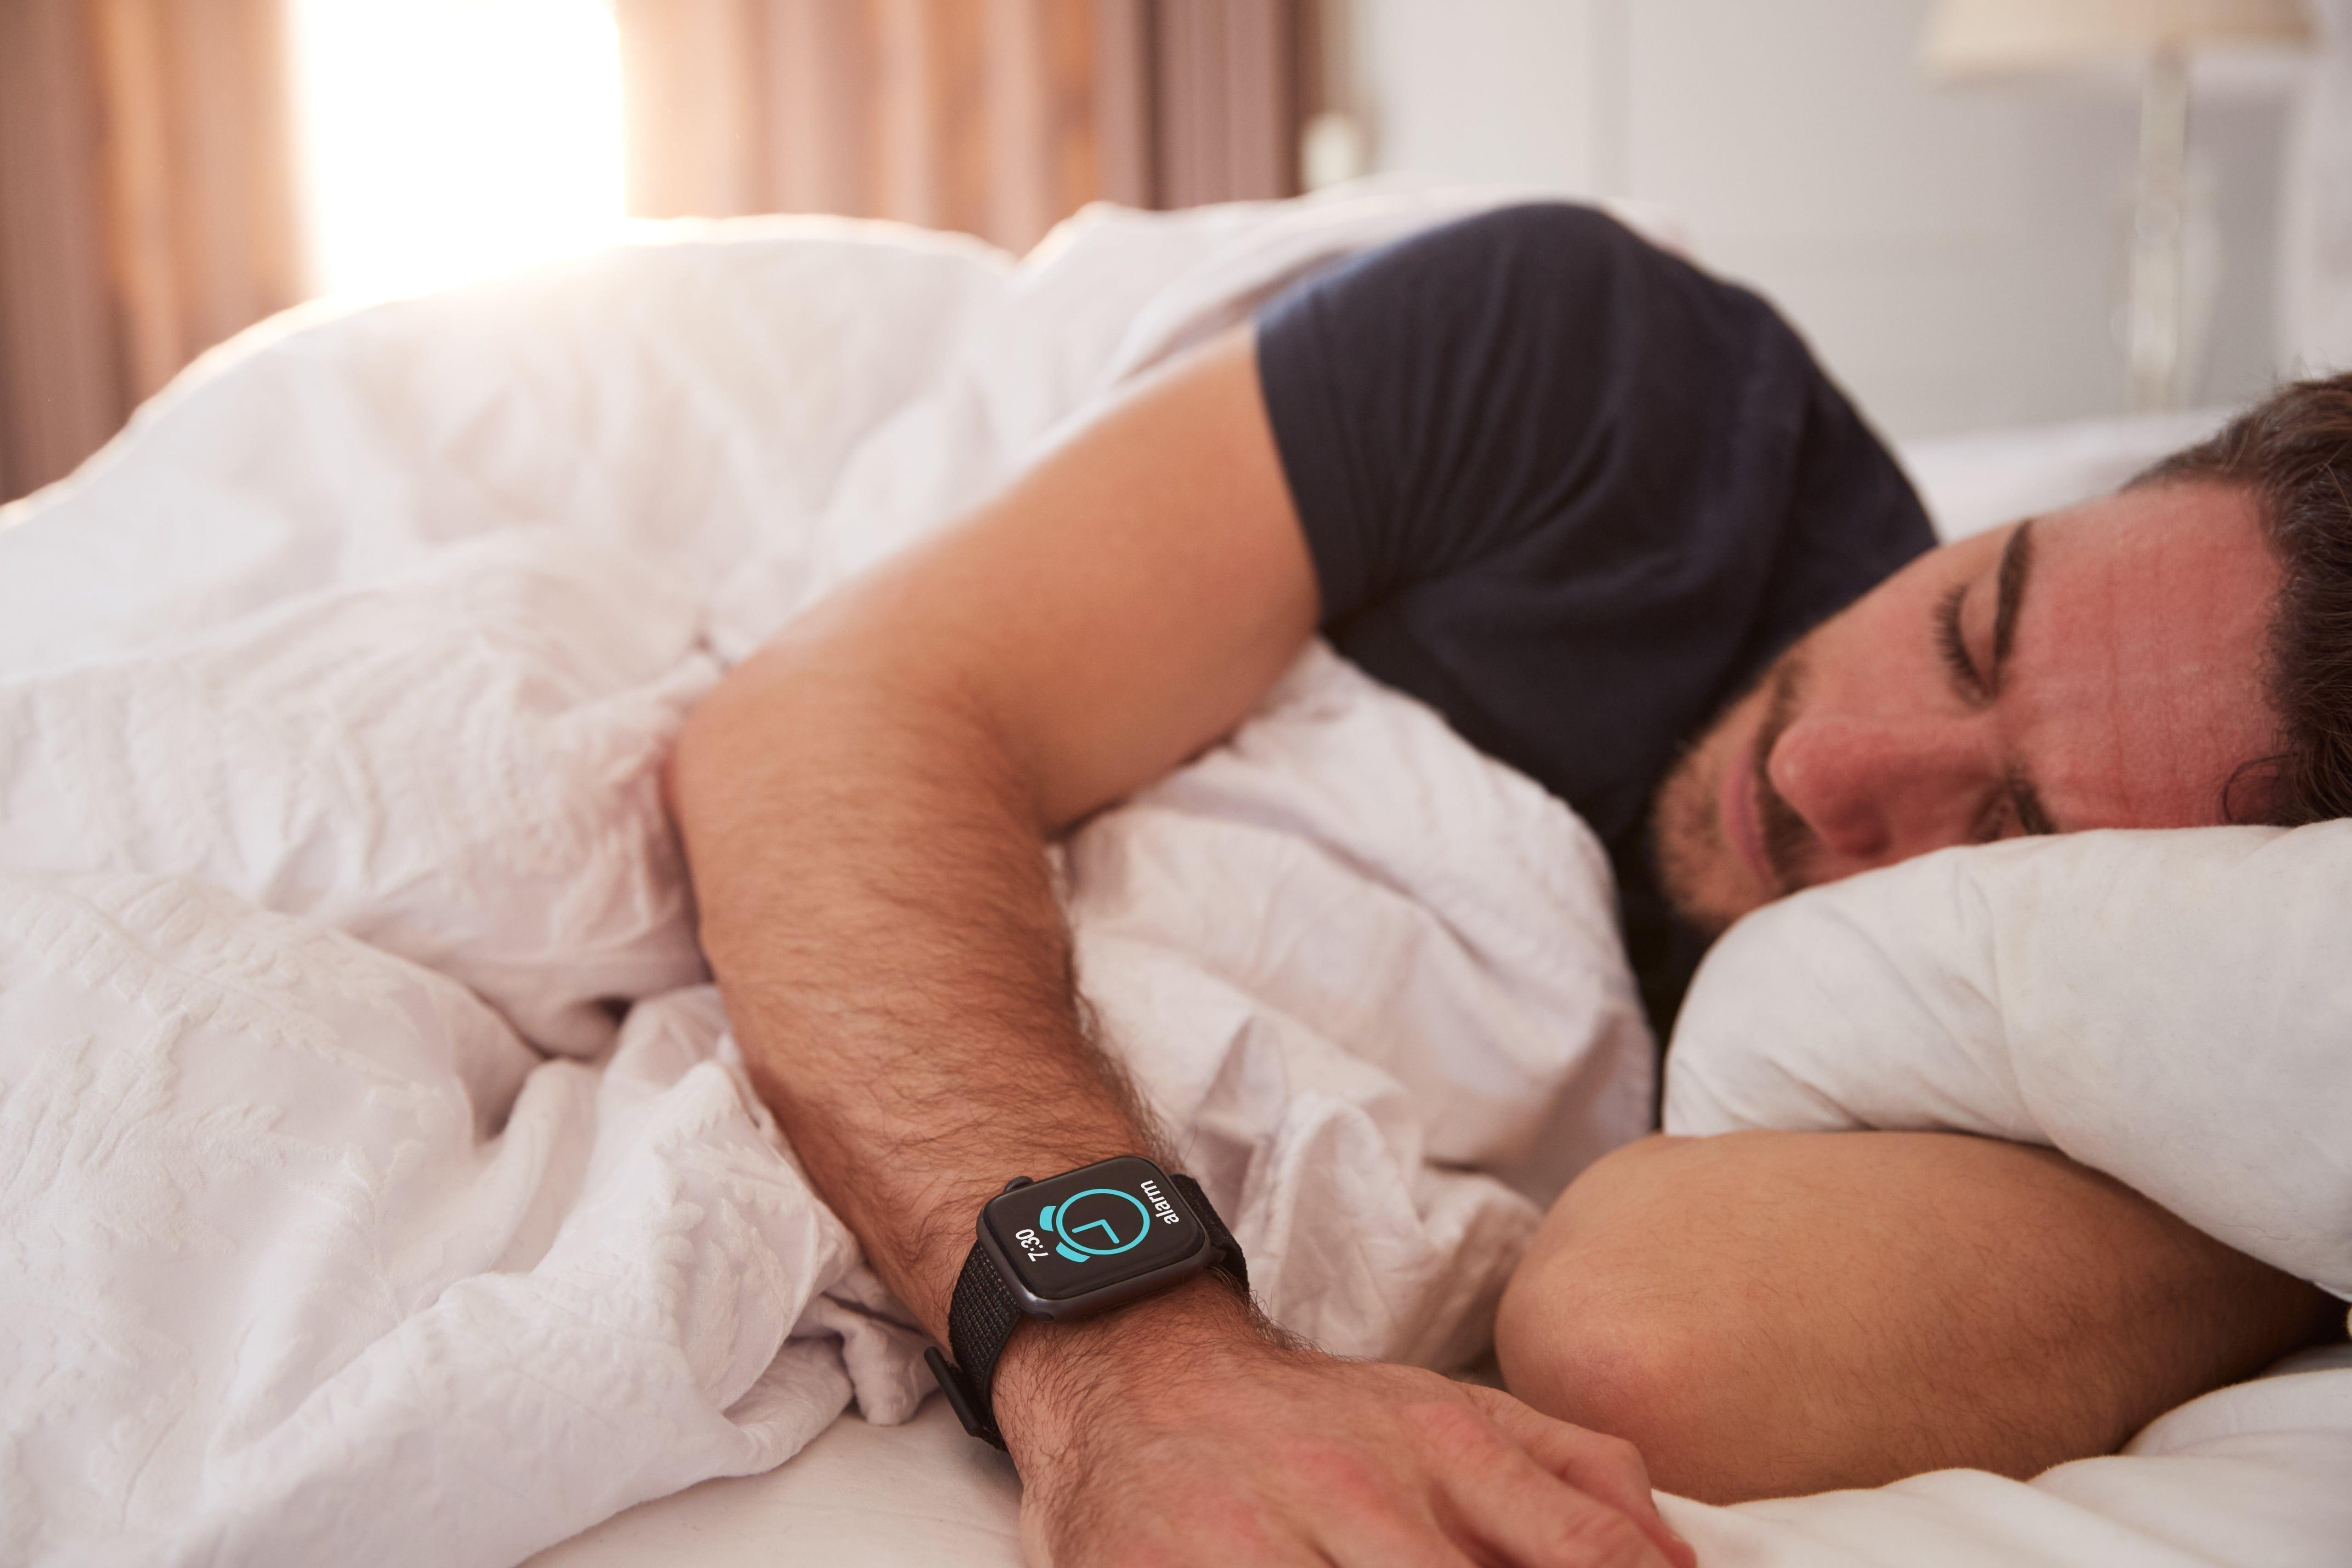 Man falls asleep fast after taking CBD and melatonin